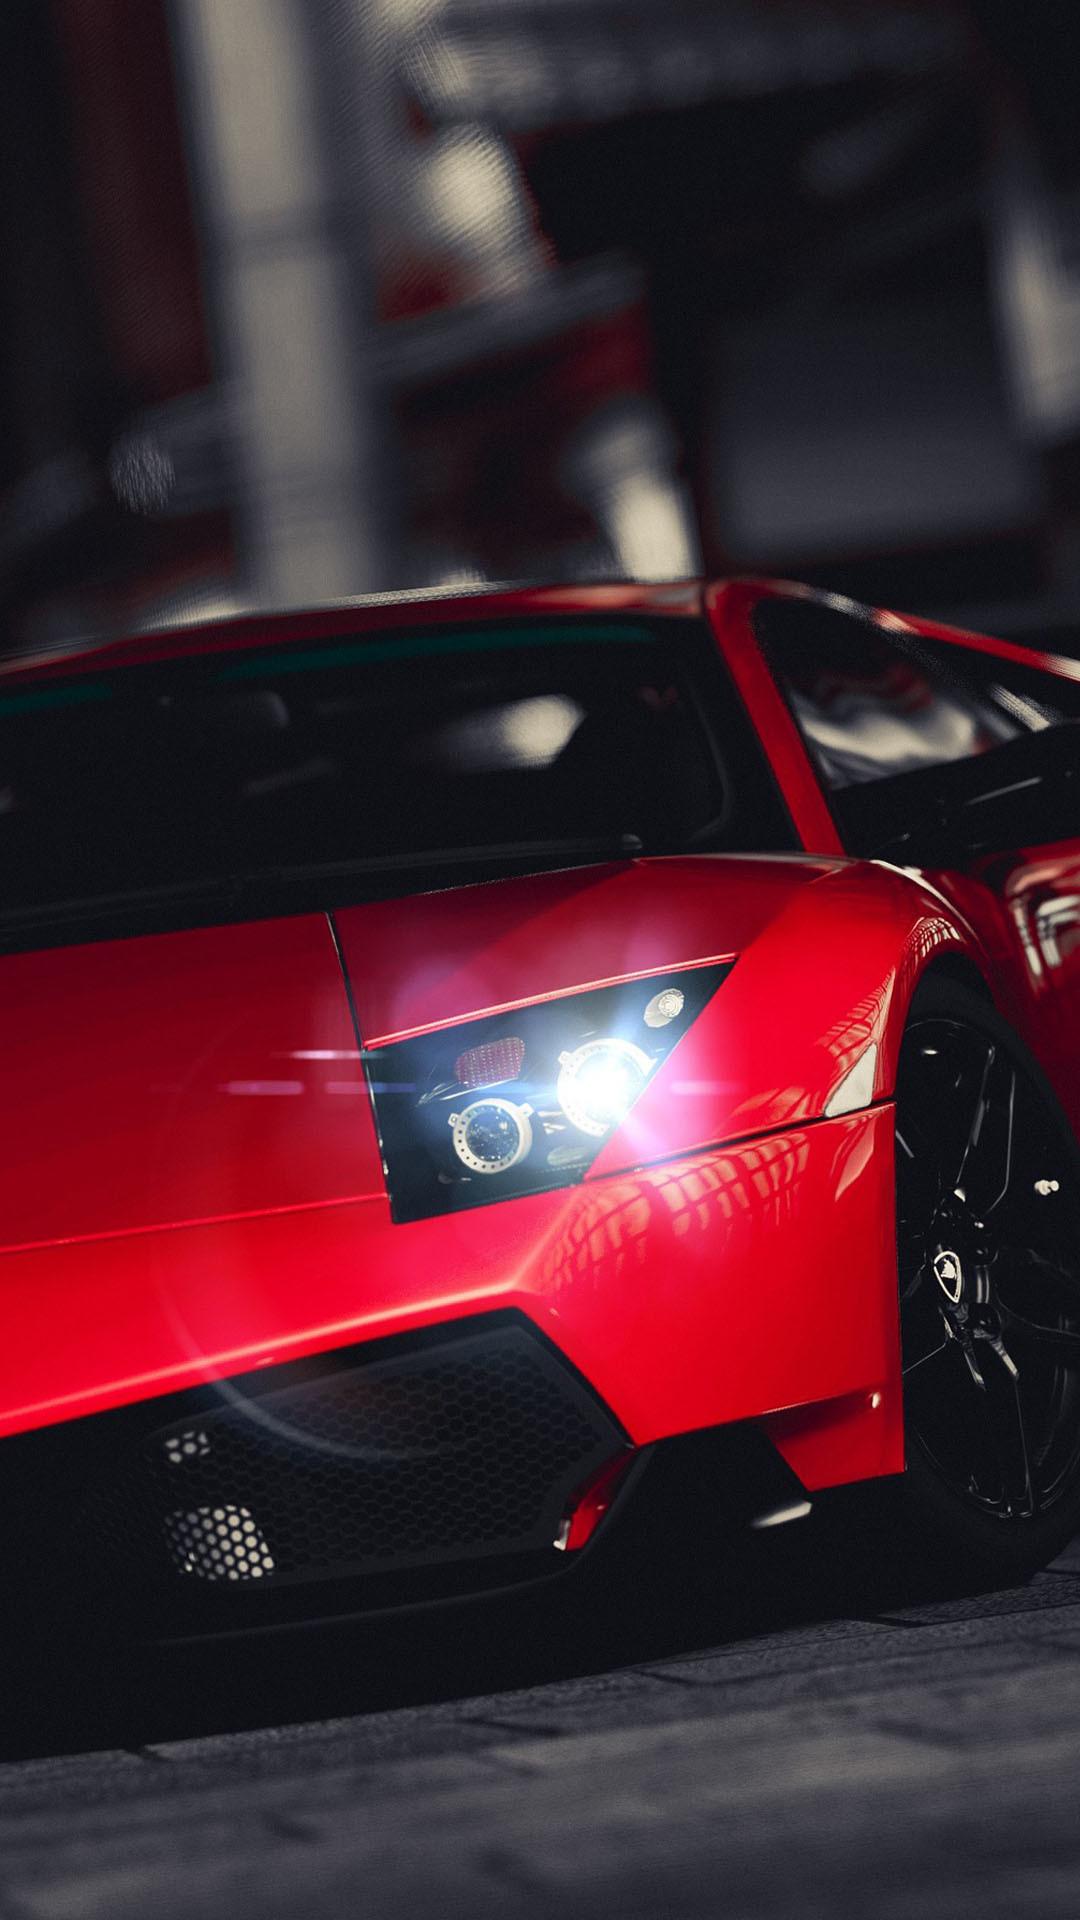 Lamborghini Veneno Bright Red iPhone 6 Plus HD Wallpaper …